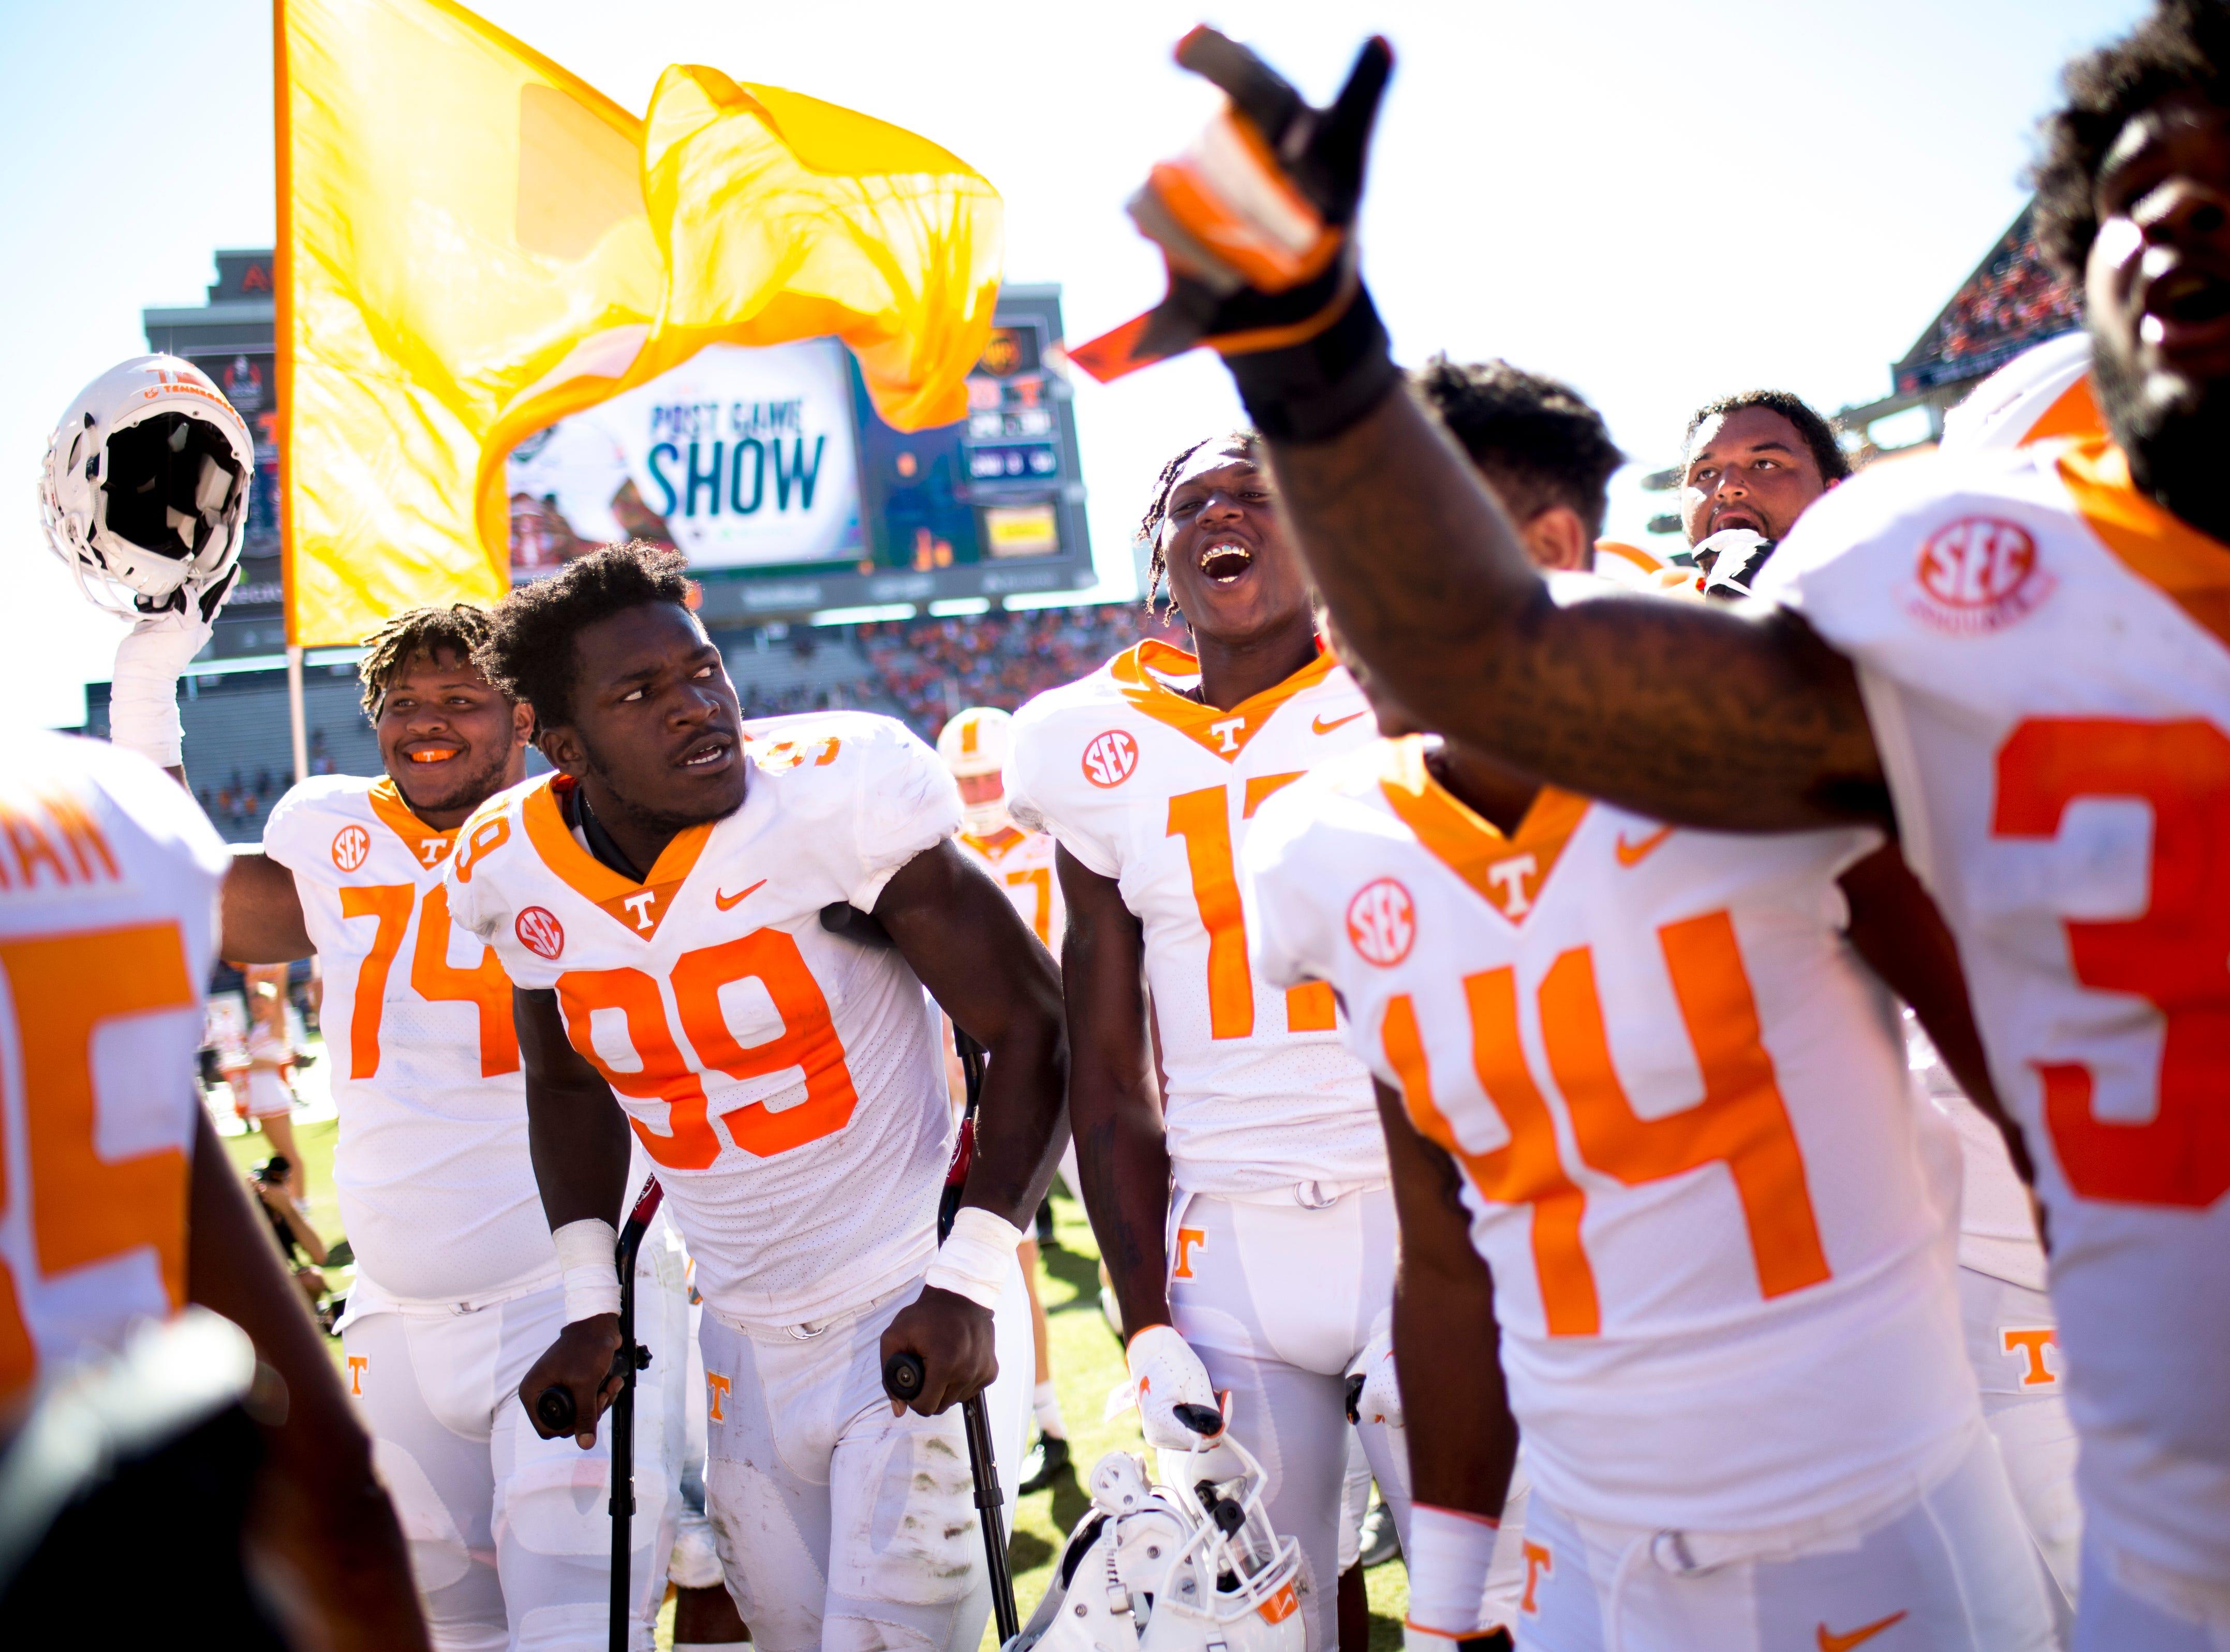 Players celebrate their 30-24 win over Auburn at Jordan-Hare Stadium in Auburn, Alabama on Saturday, October 13, 2018.